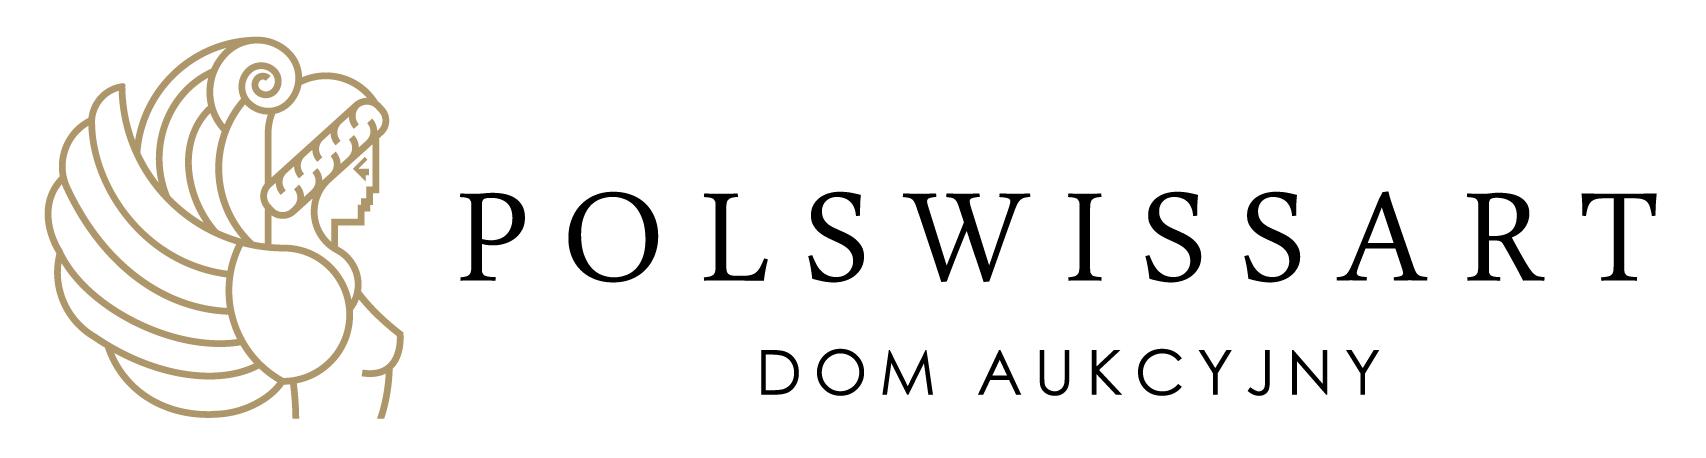 Polswissart